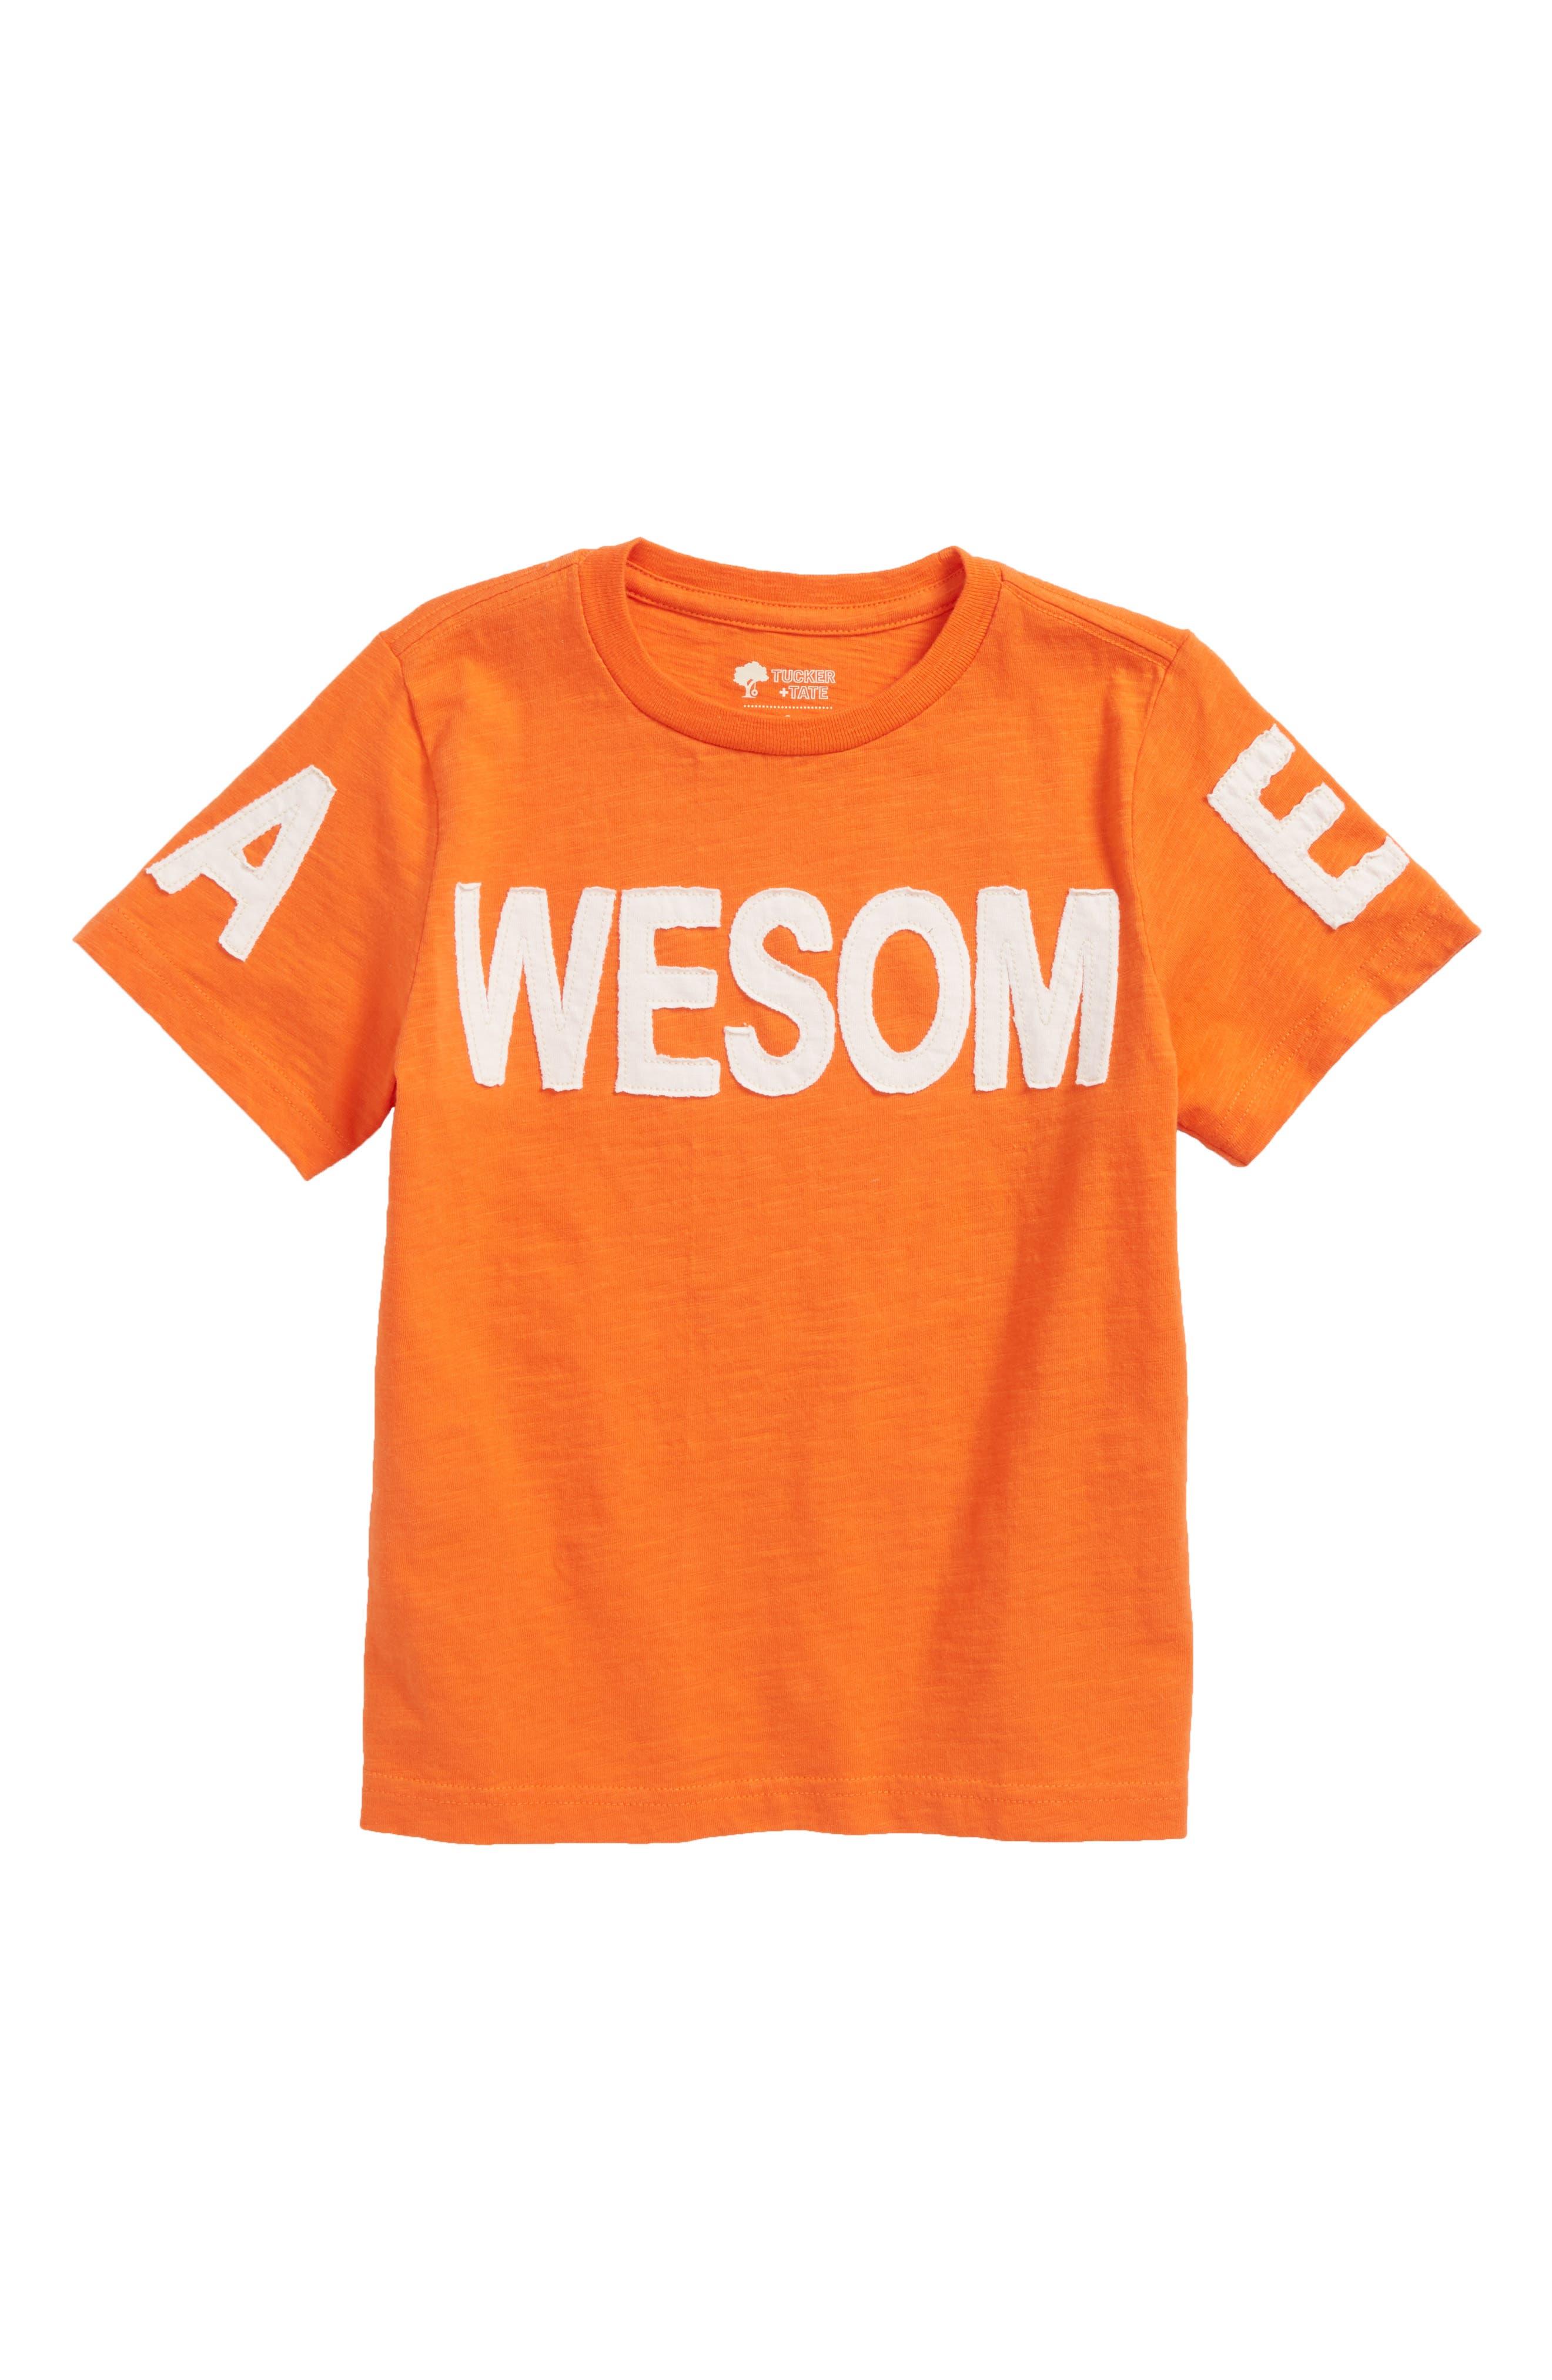 Awesome Appliqué T-Shirt,                             Main thumbnail 1, color,                             800